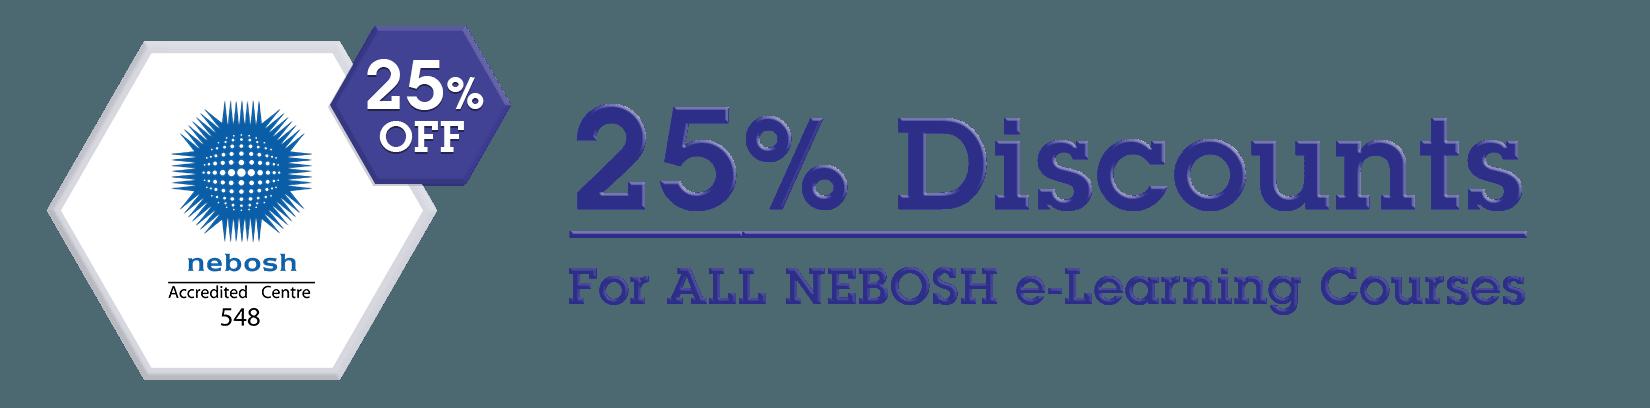 NEBOSH Discount Offer 25%